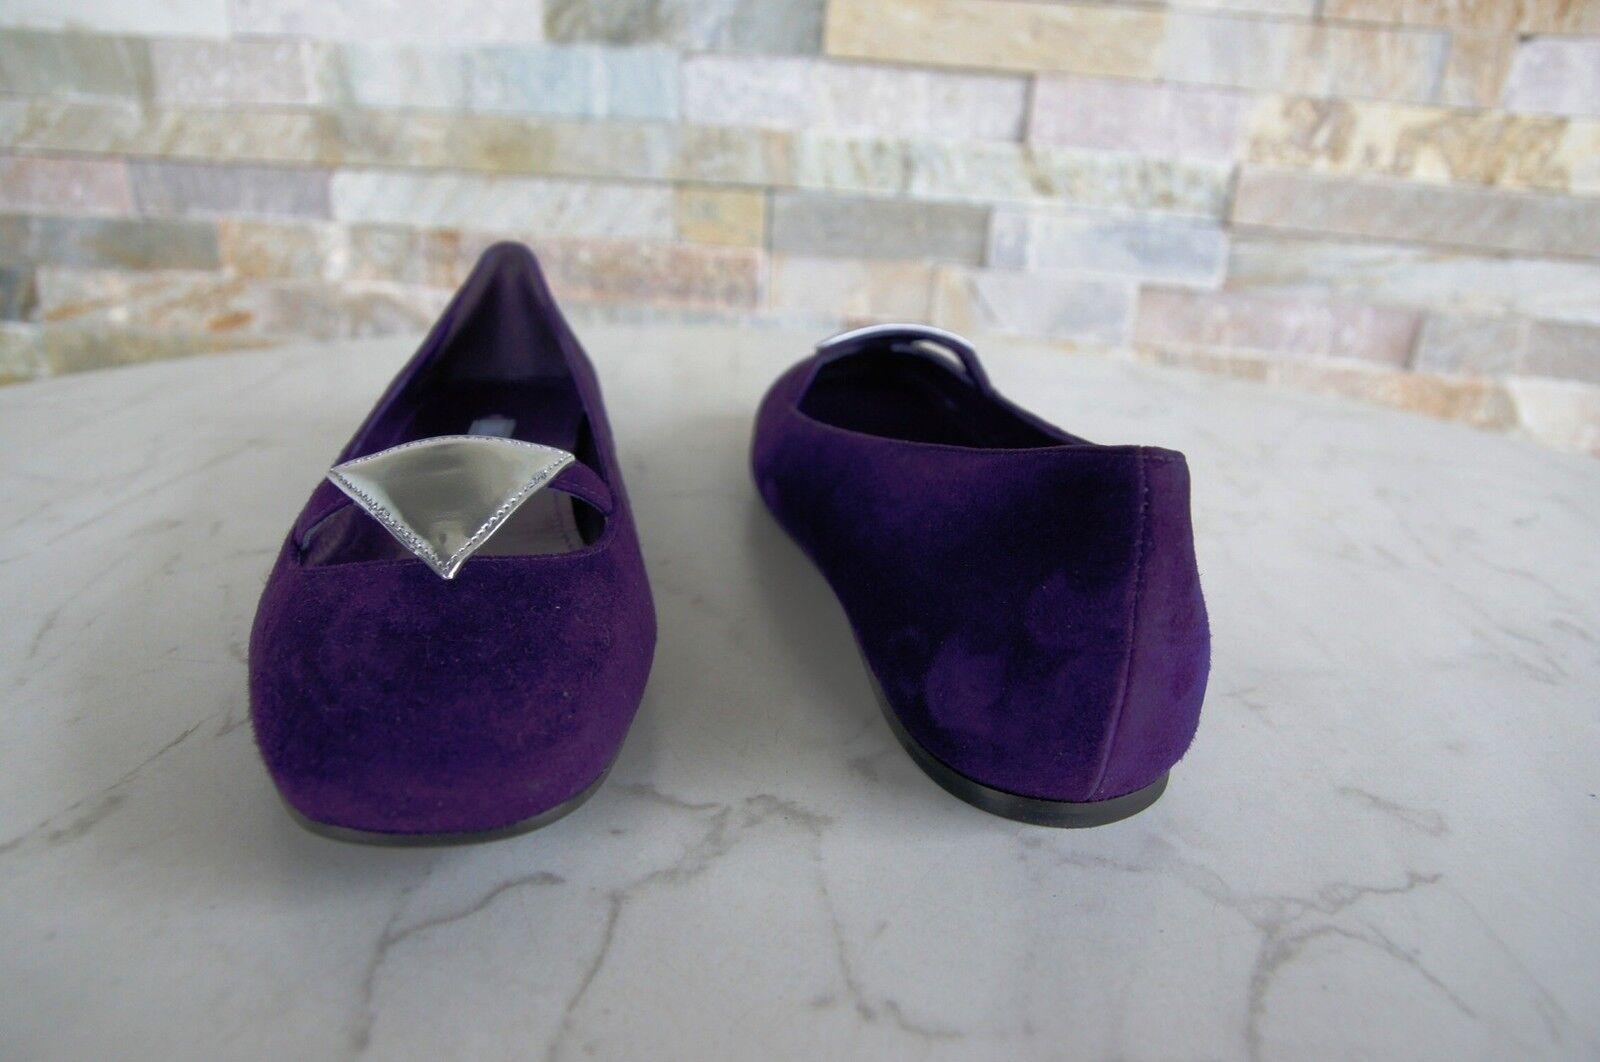 PRADA Gr 37 Ballerinas Slipper Schuhe schuhe Ziege 1F355F Ziege schuhe violett NEU 5c33fe